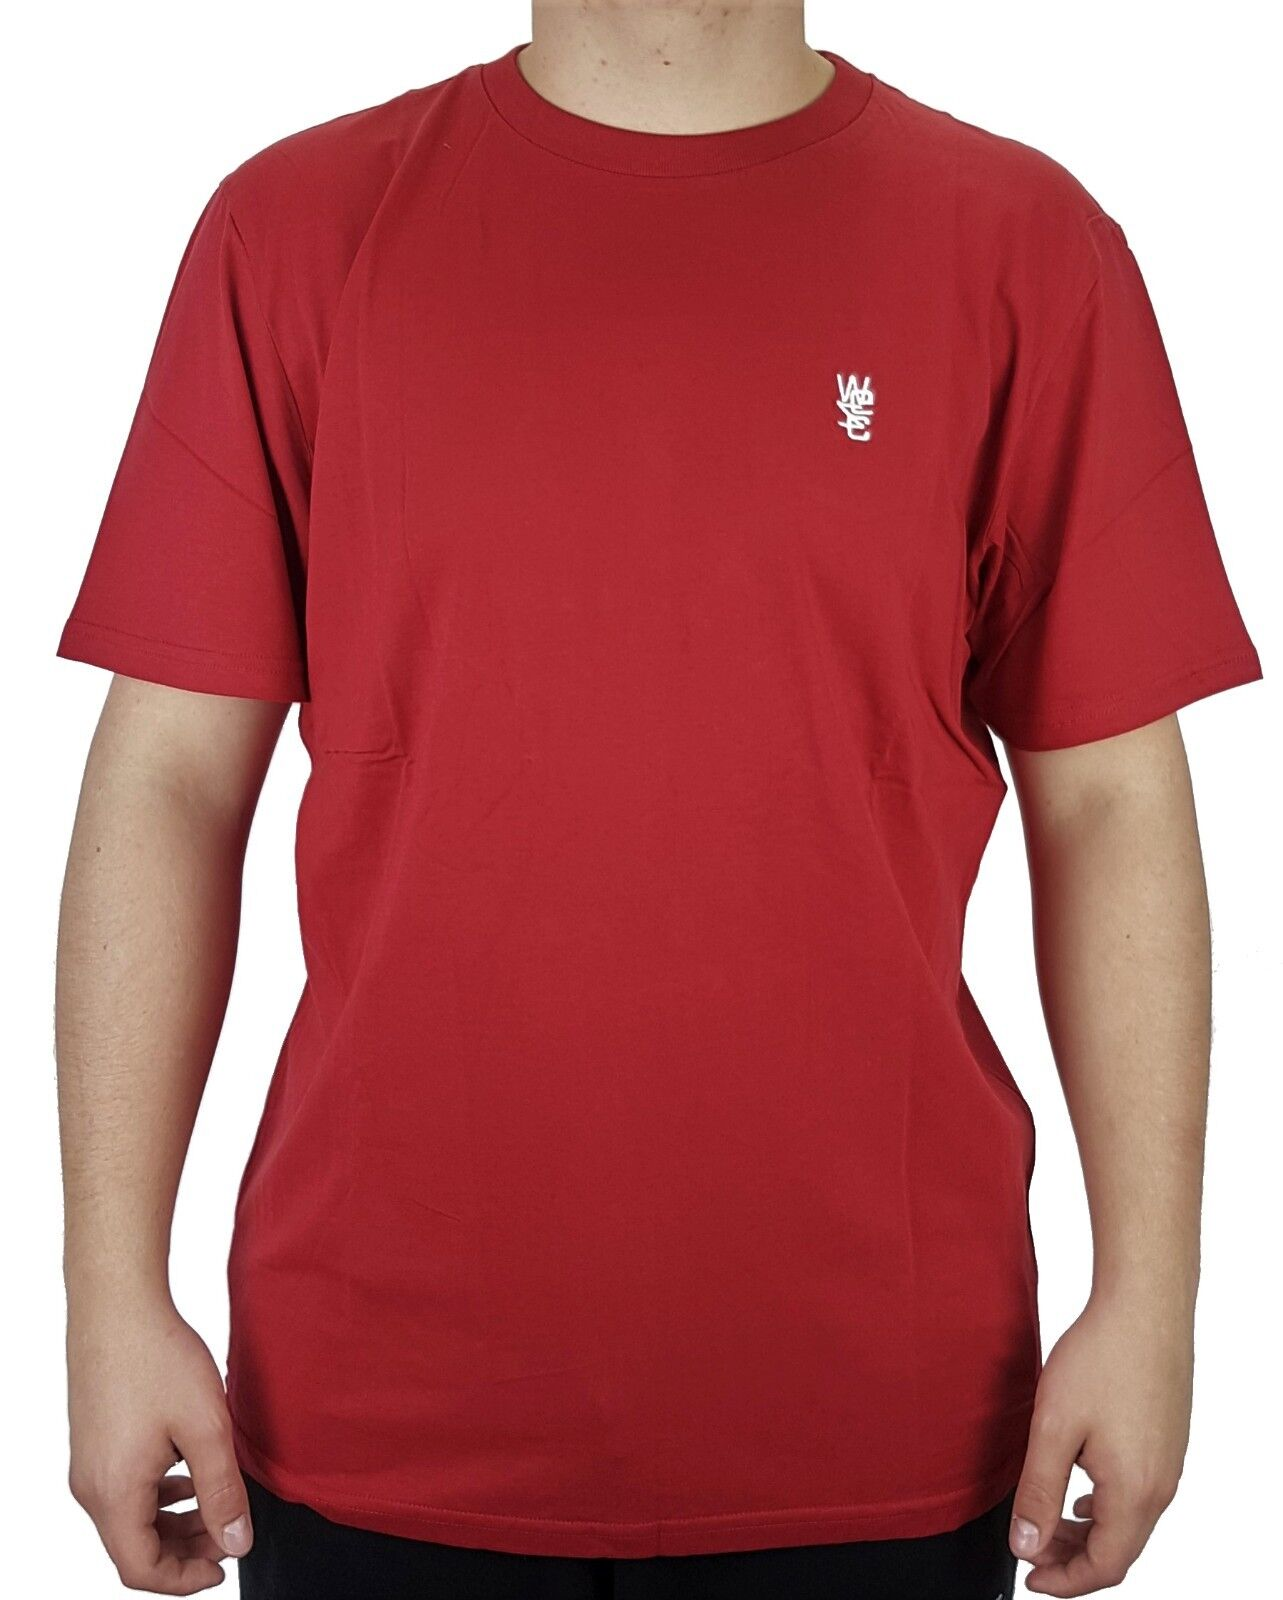 WESC Ove Herren T-Shirt Shirt Freizeitshirt Herrenshirt Kurzarmshirt Rundhals